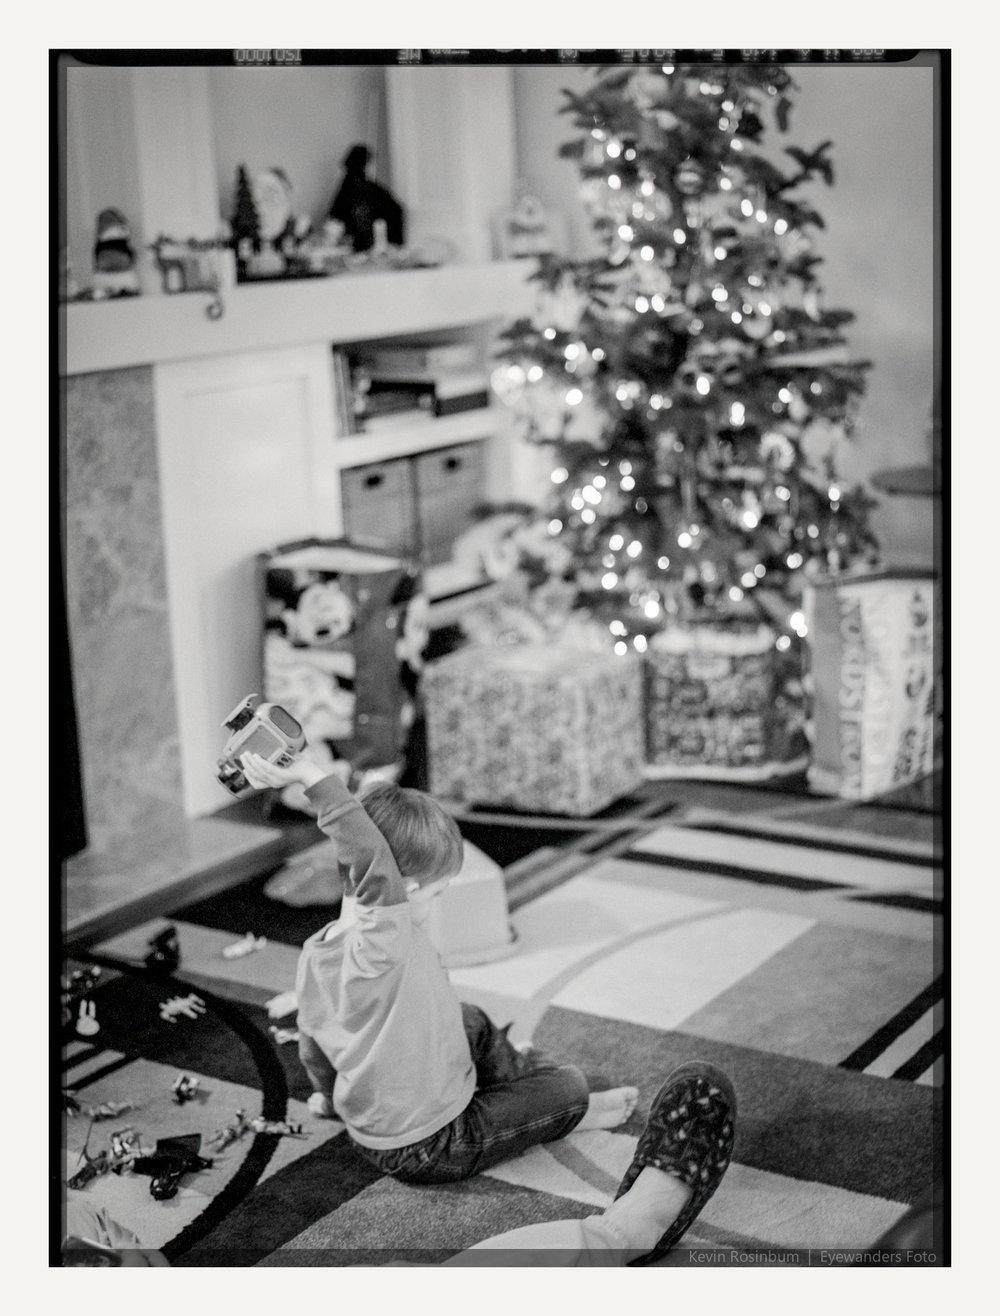 Christmas Score! | Pentax 645NII 45mm | HP5+ | Kevin Rosinbum